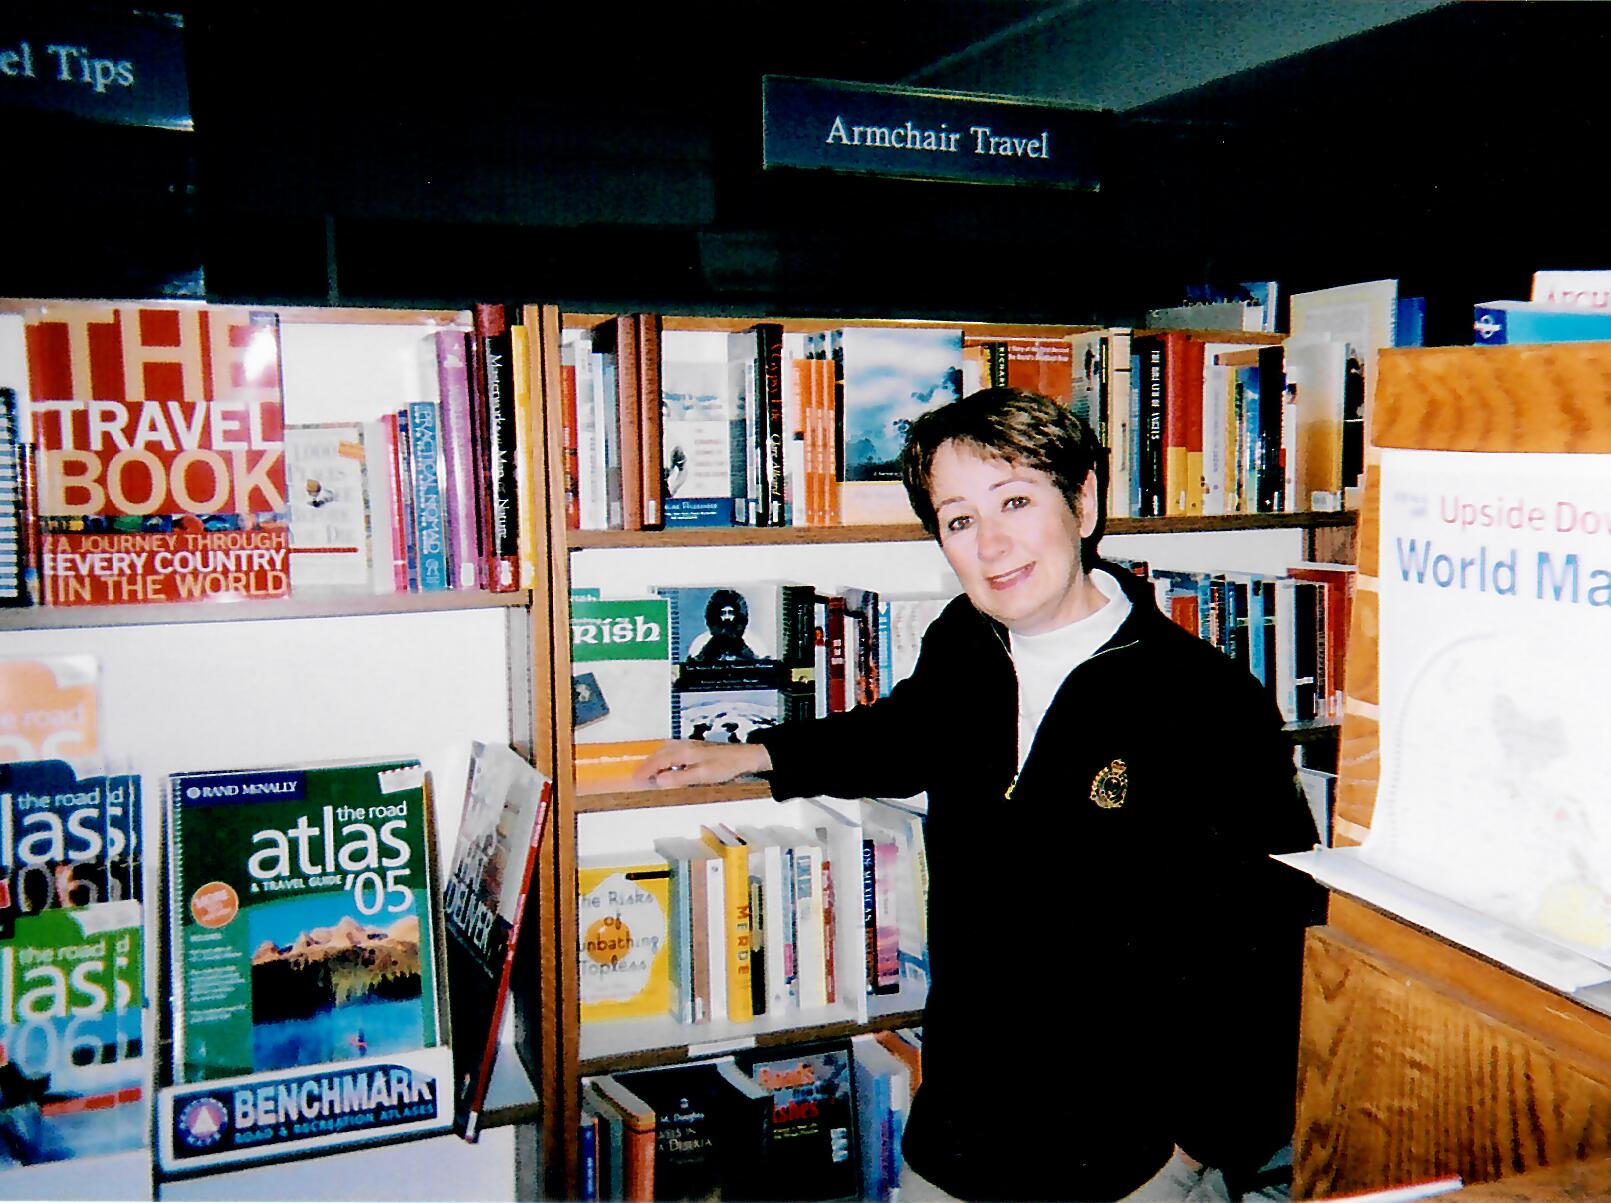 Book signing at Auntie's Bookstore, Spokane, Washington